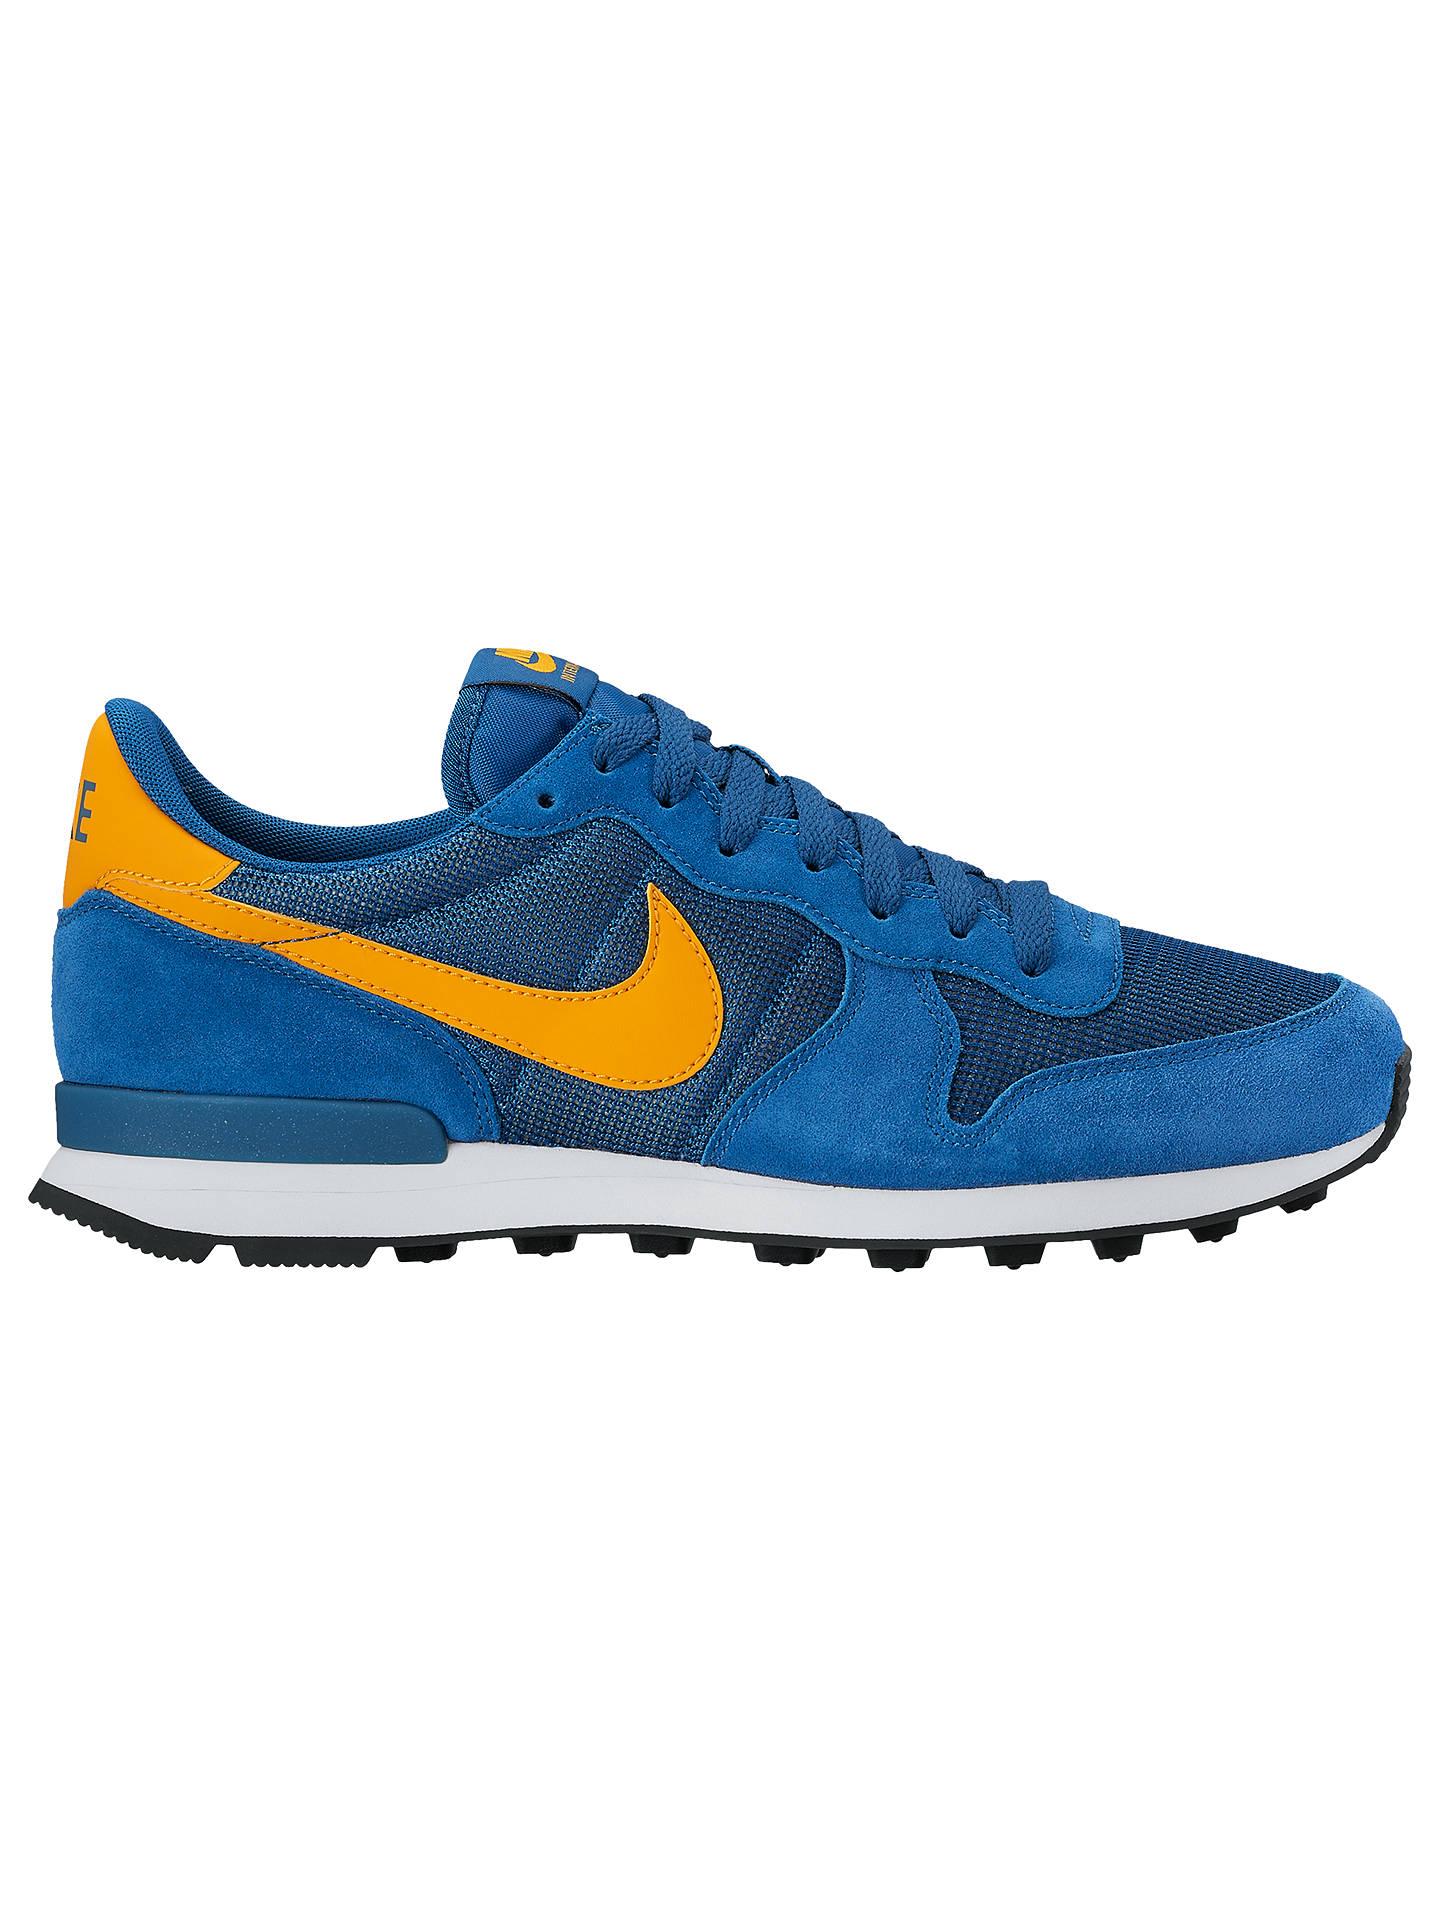 super popular f12cf 80fcc Buy Nike Internationalist Men s Trainers, Blue, 7 Online at johnlewis. ...